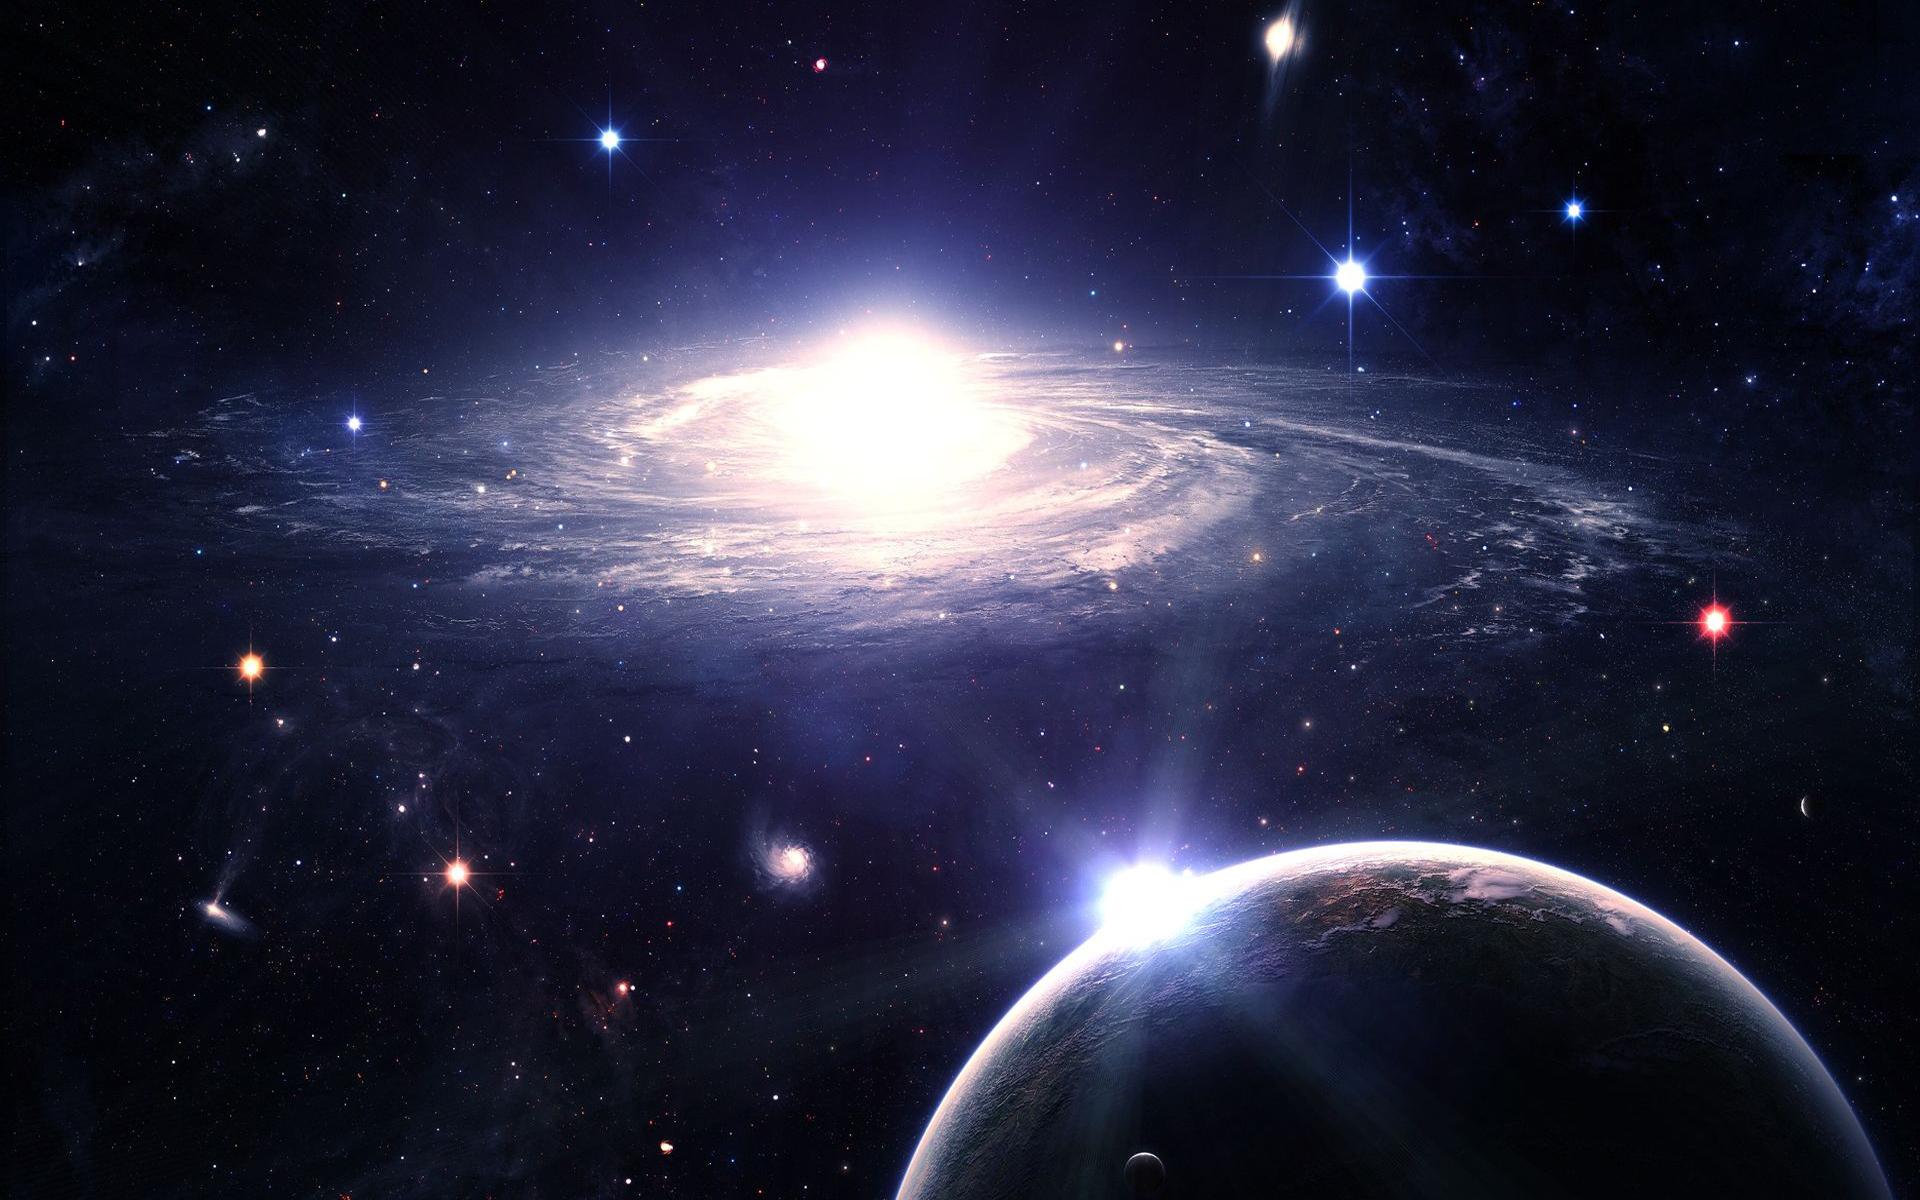 Картинки о космосе галактики и звезды